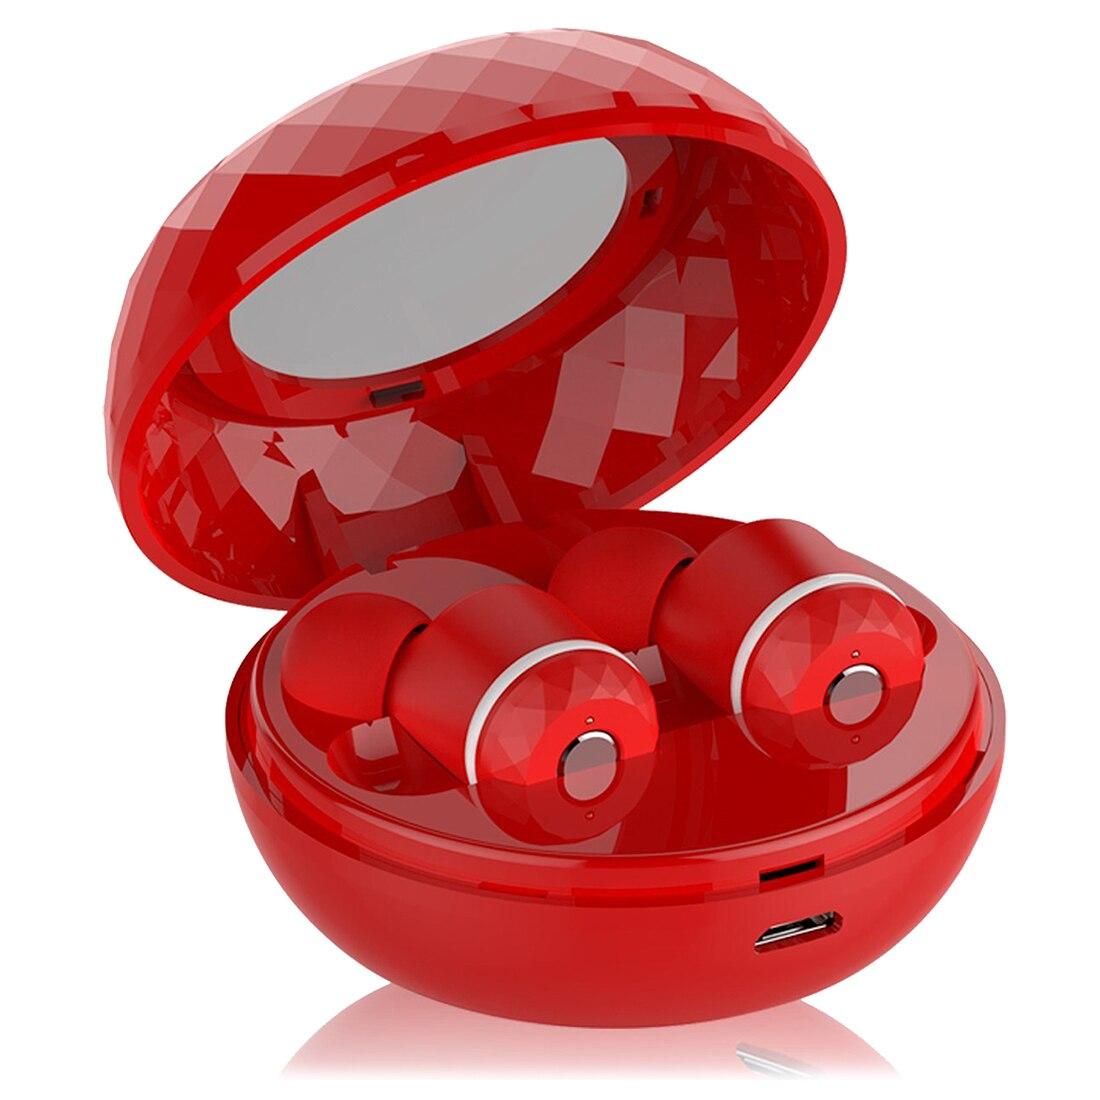 Wireless Earbuds, True Wireless Stereo Bluetooth V4.1 Headphones with Charging Case &amp; Noise Earphones Sweatproof In-Ear Headset<br>